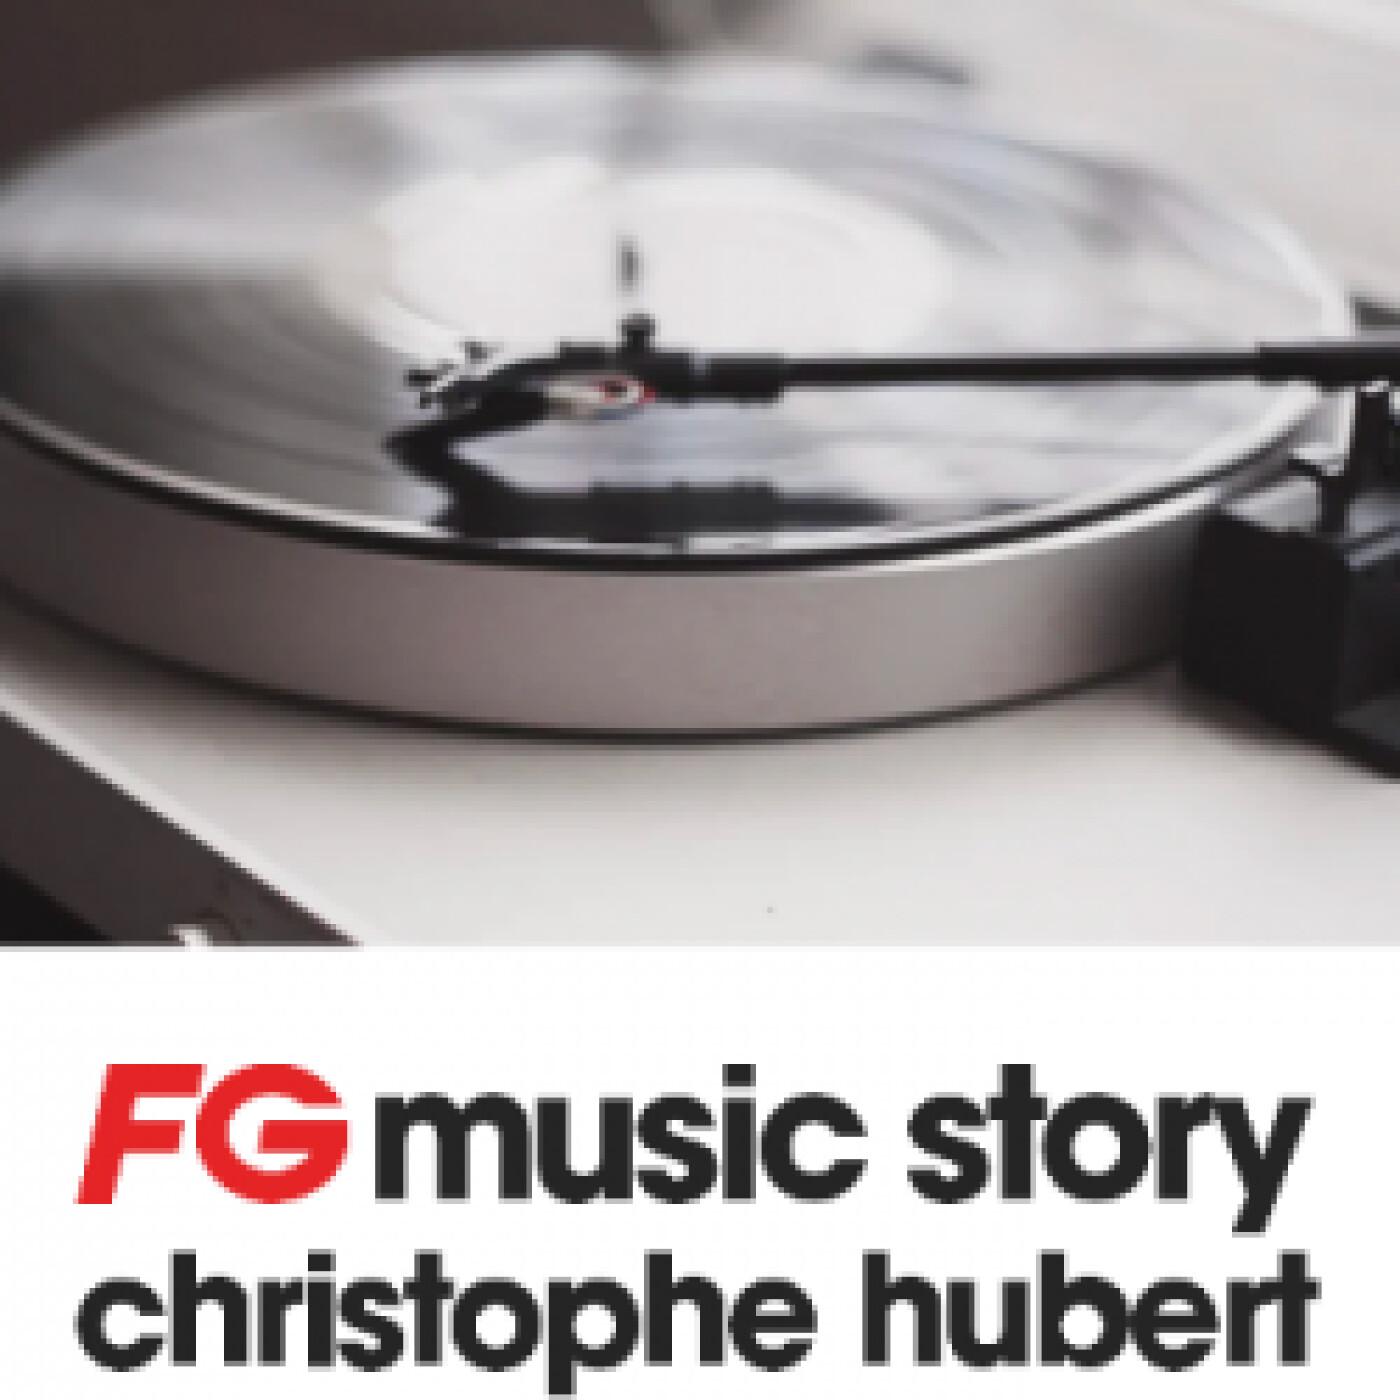 FG MUSIC STORY : ALAIA & GALLO